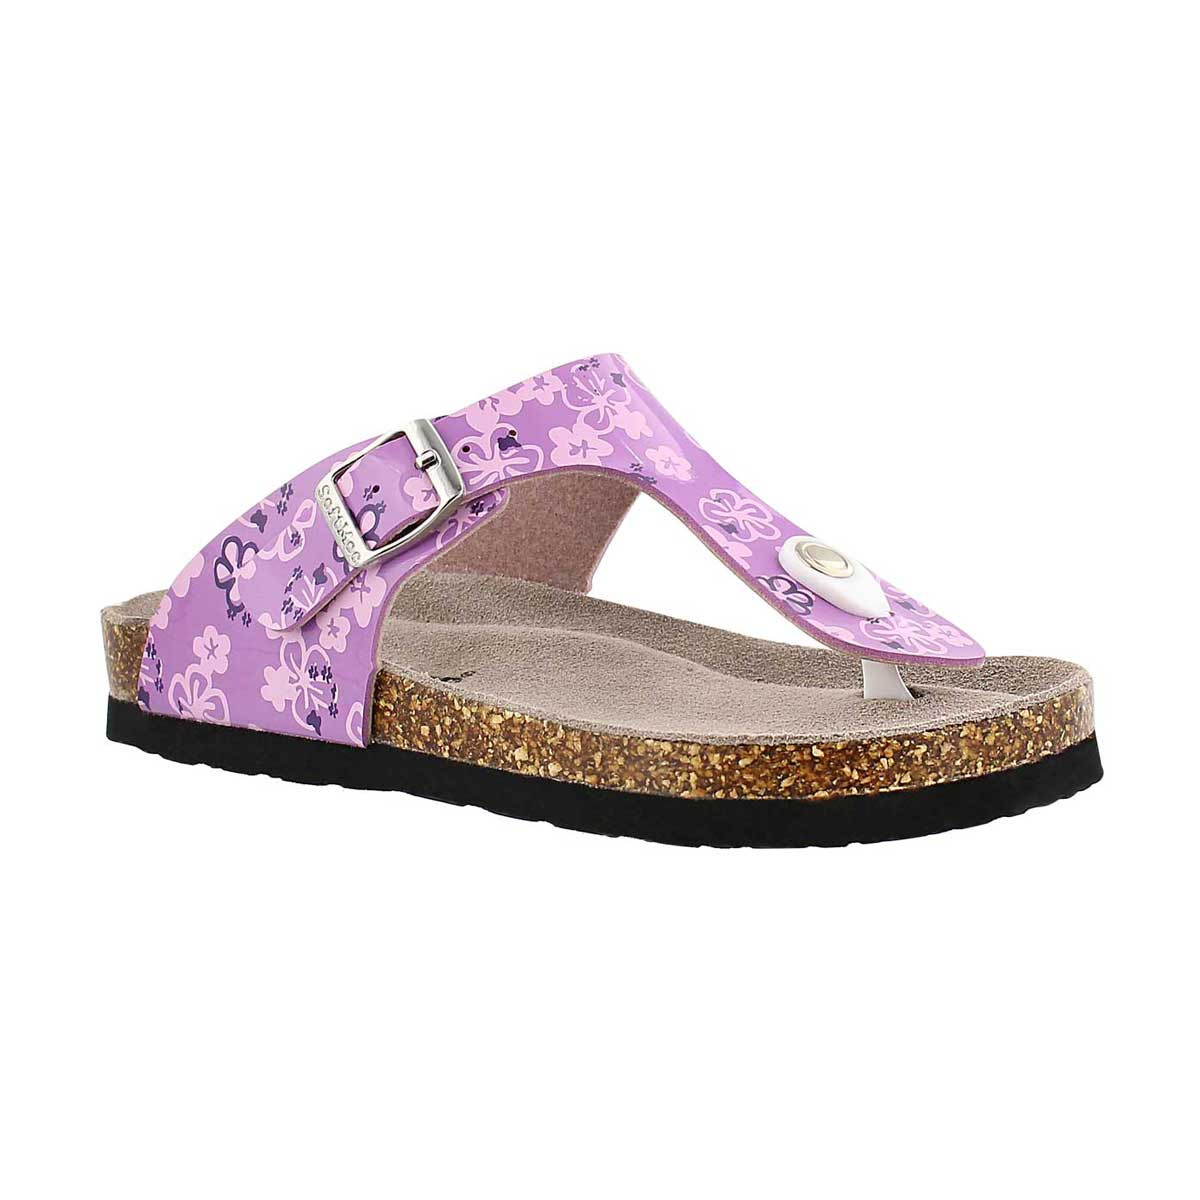 Grls Alison purple print thong sandal